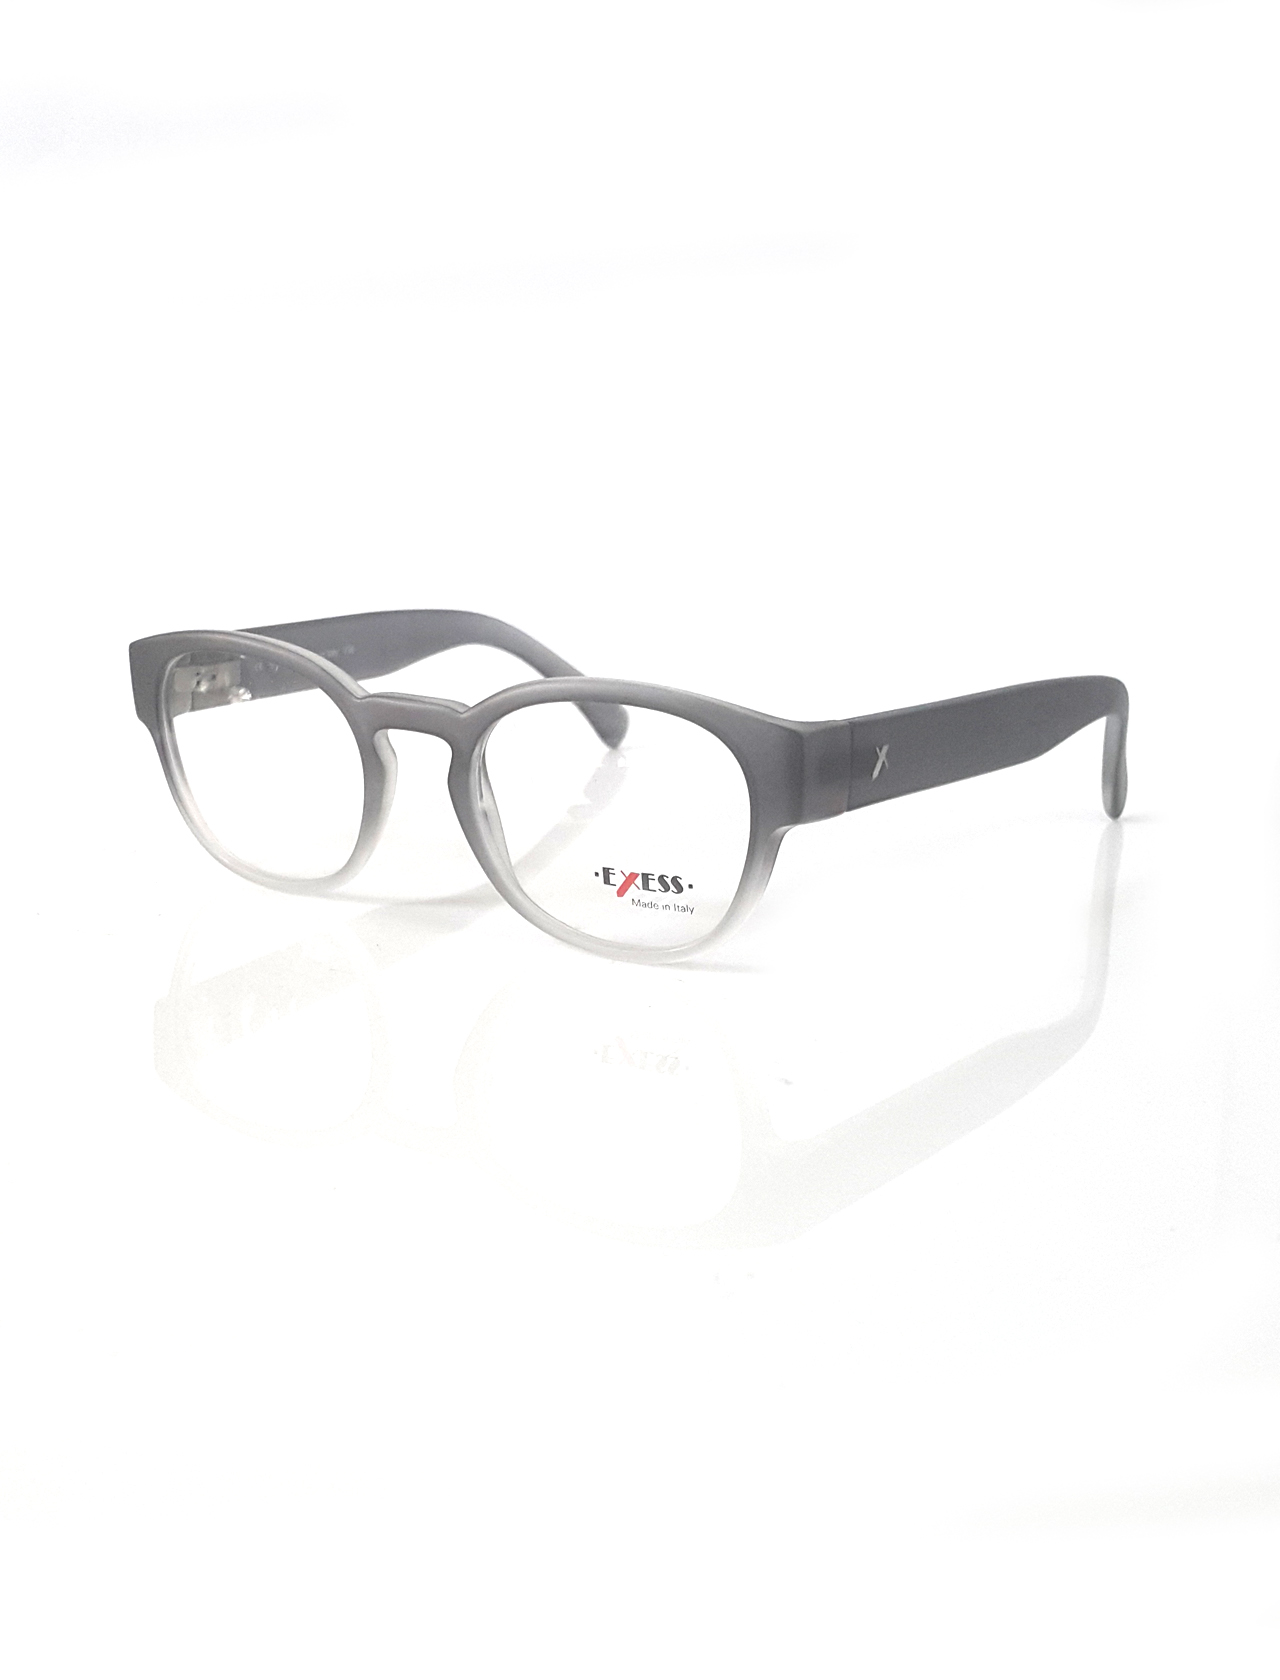 Markamilla Unisex Reading Glasses Frame Demo Glasses Eyewear Transparent High Quality Women MenExess E 303 9075 49